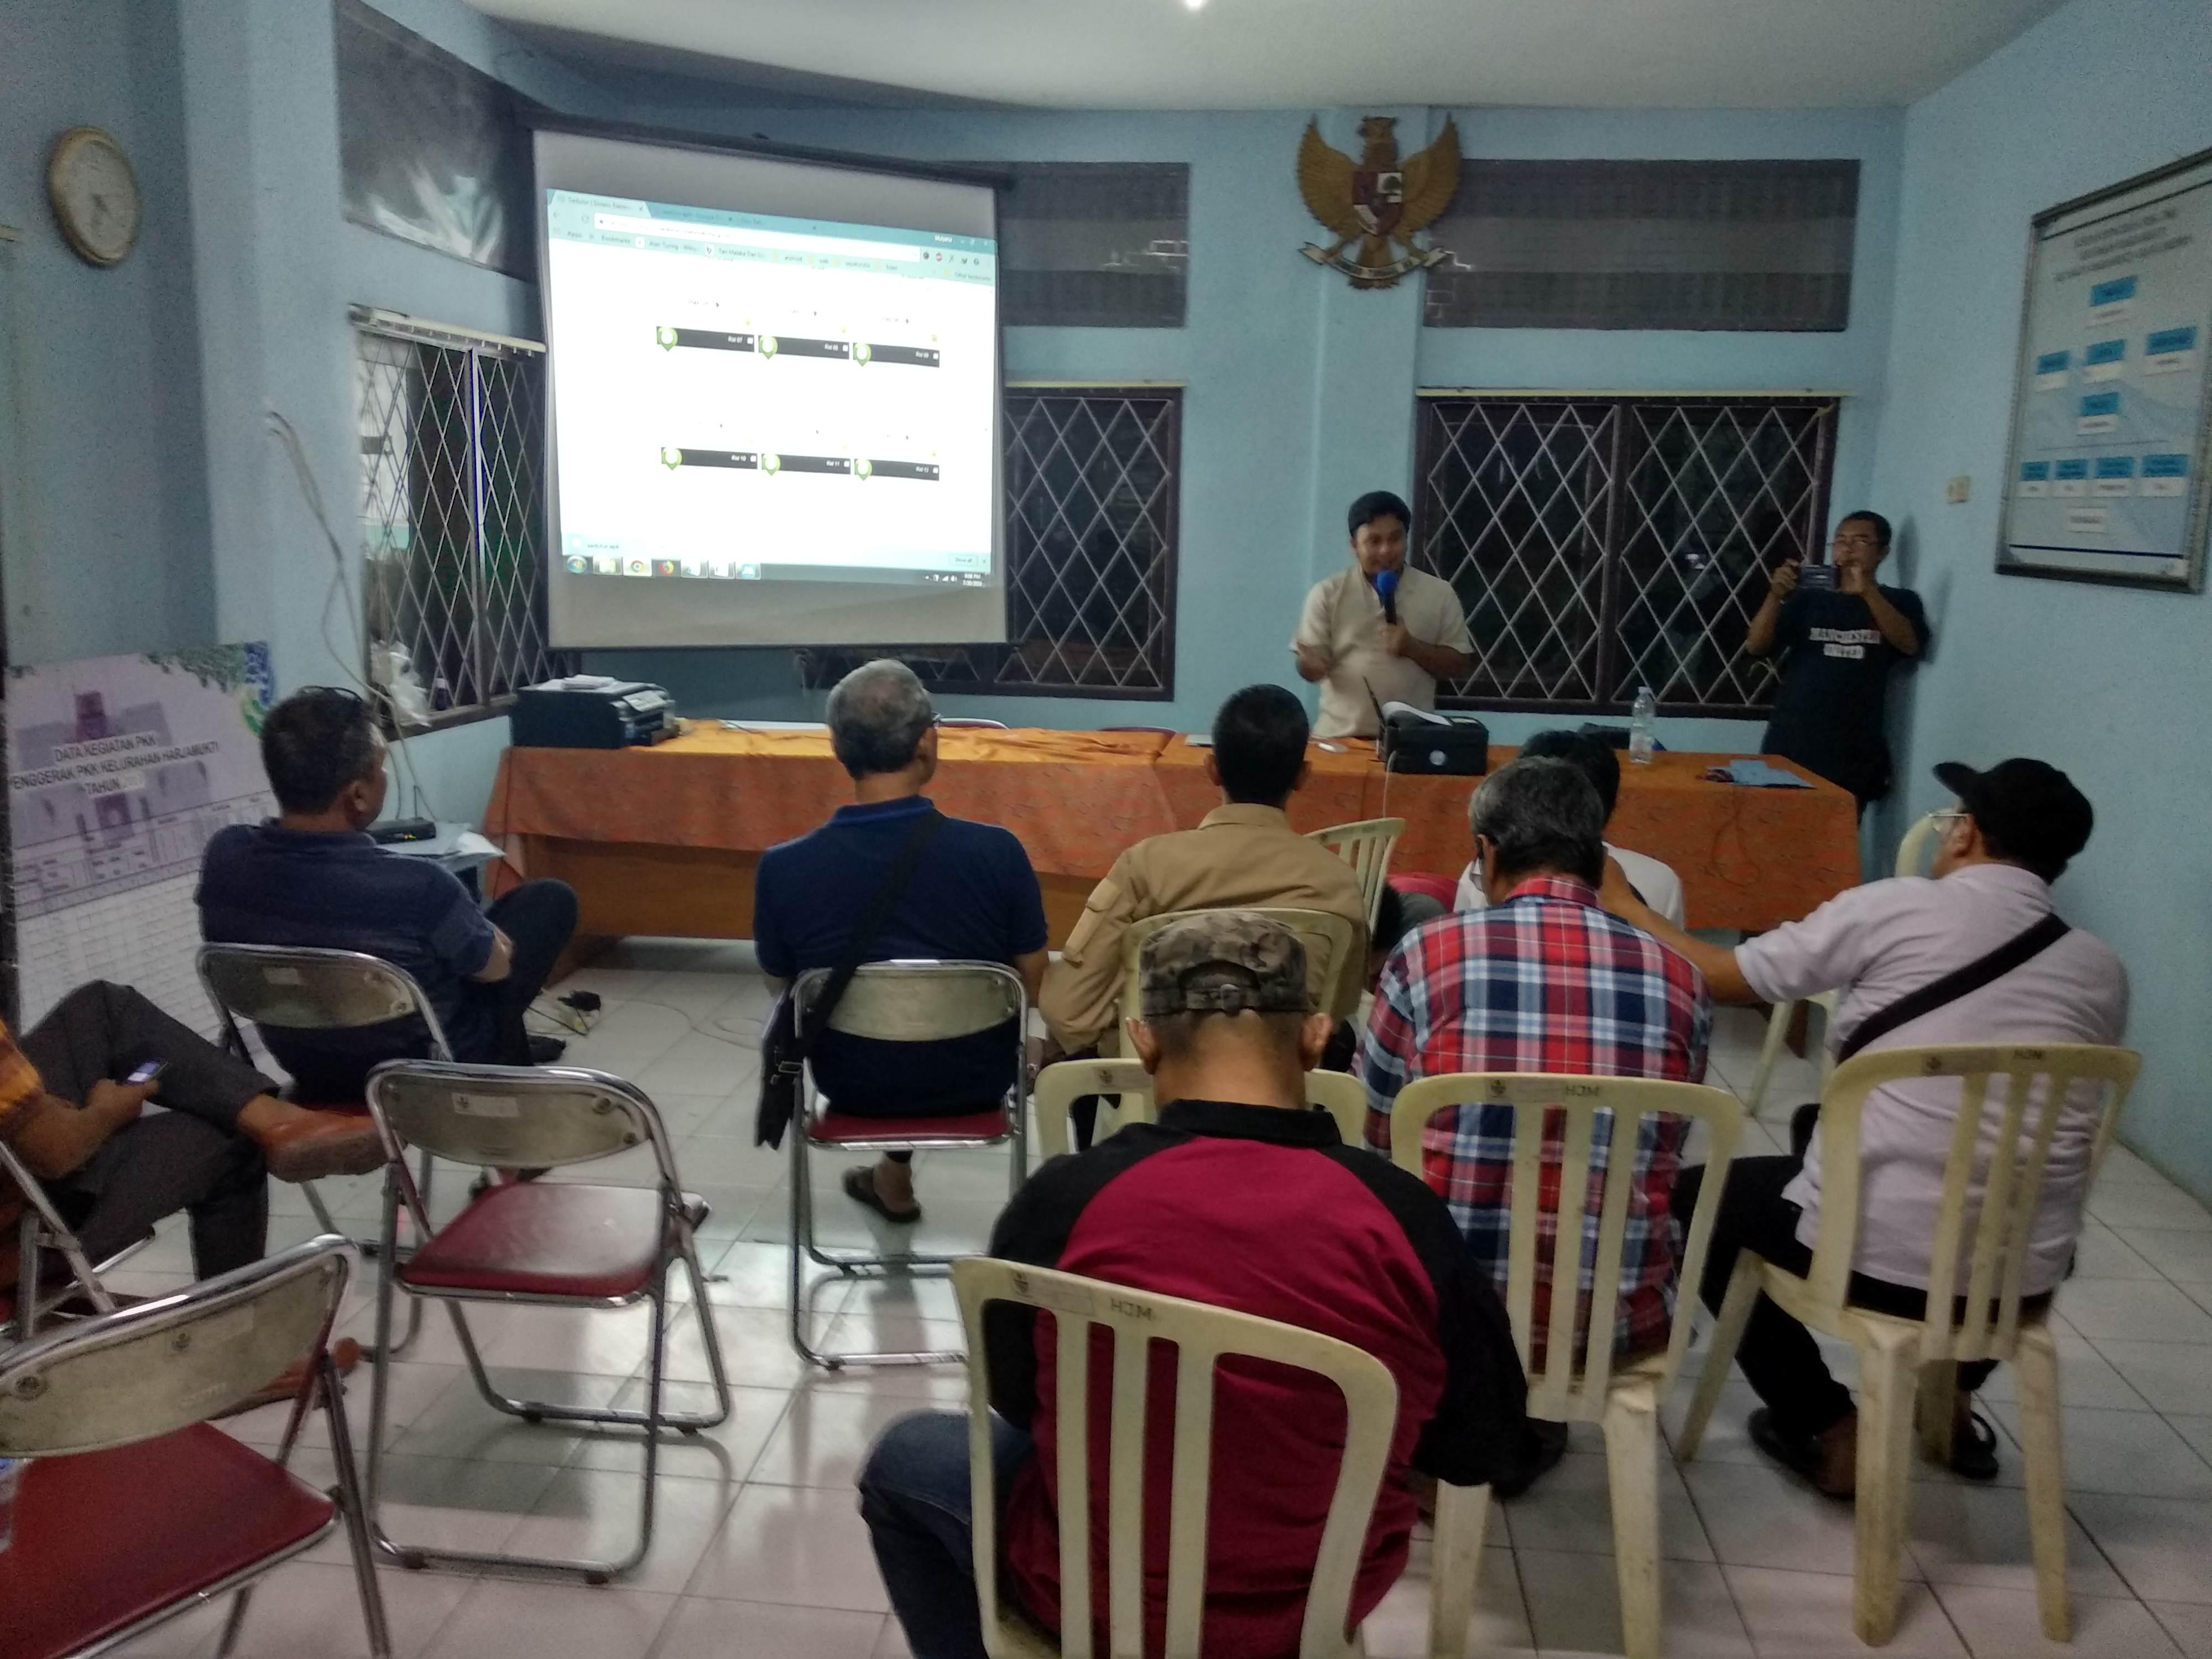 Pelatihan Pelayanan Berbasis Android Kelurahan Harjamukti Kecamatan Harjamukti Kota Cirebon